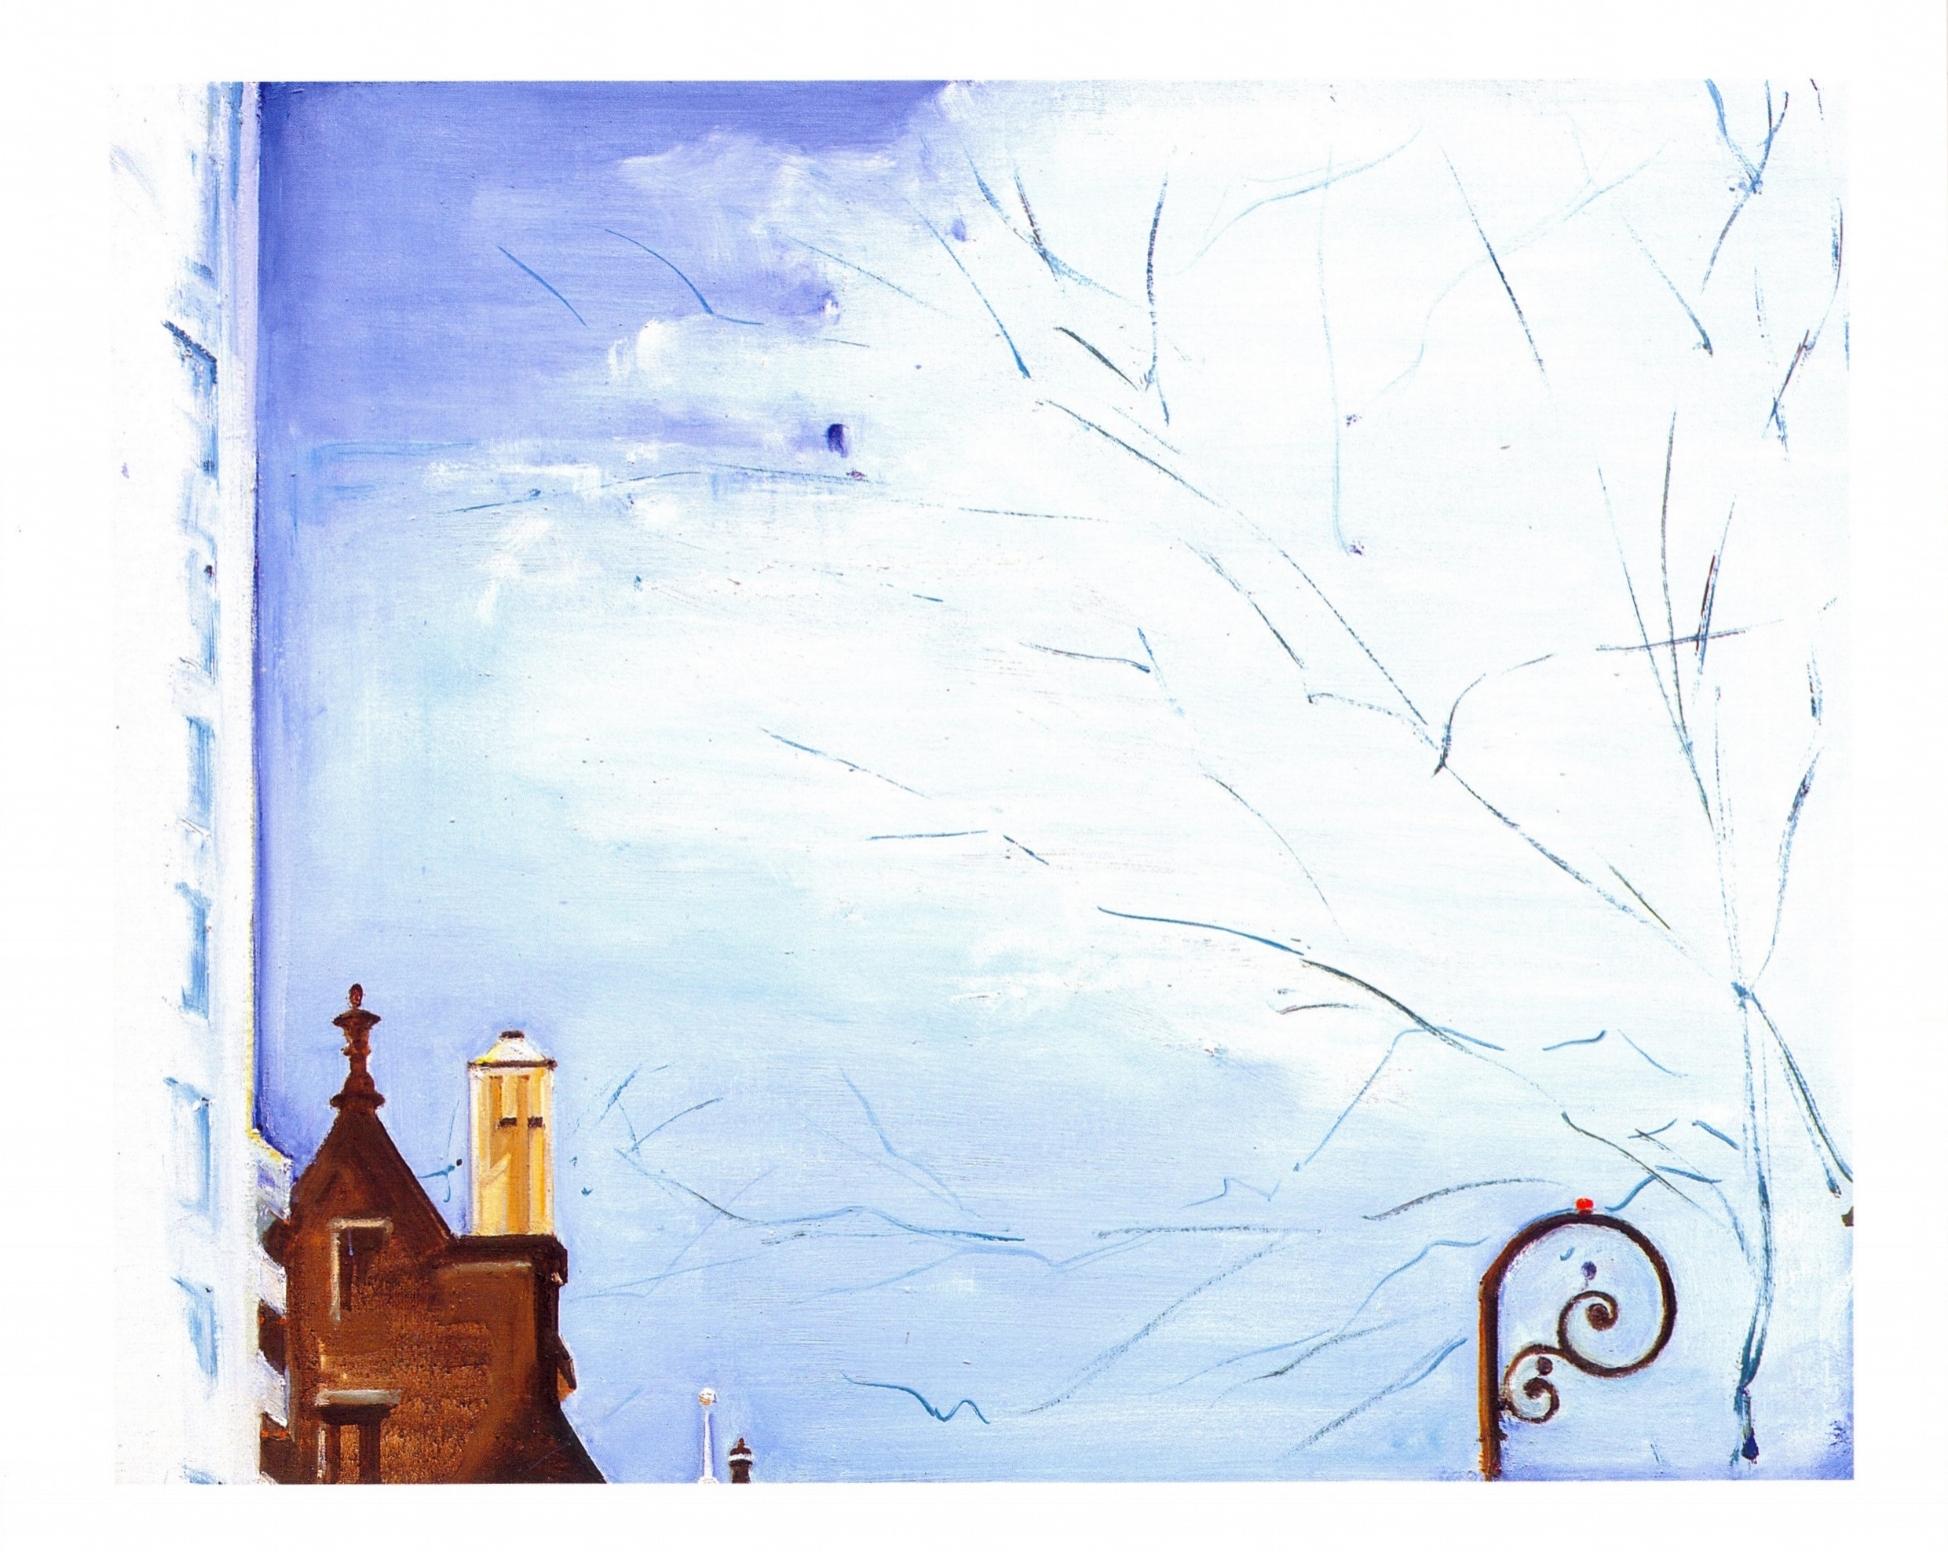 Above the Dakota, Skyscape 7   Oil on canvas, 24'' x 30'', 2004